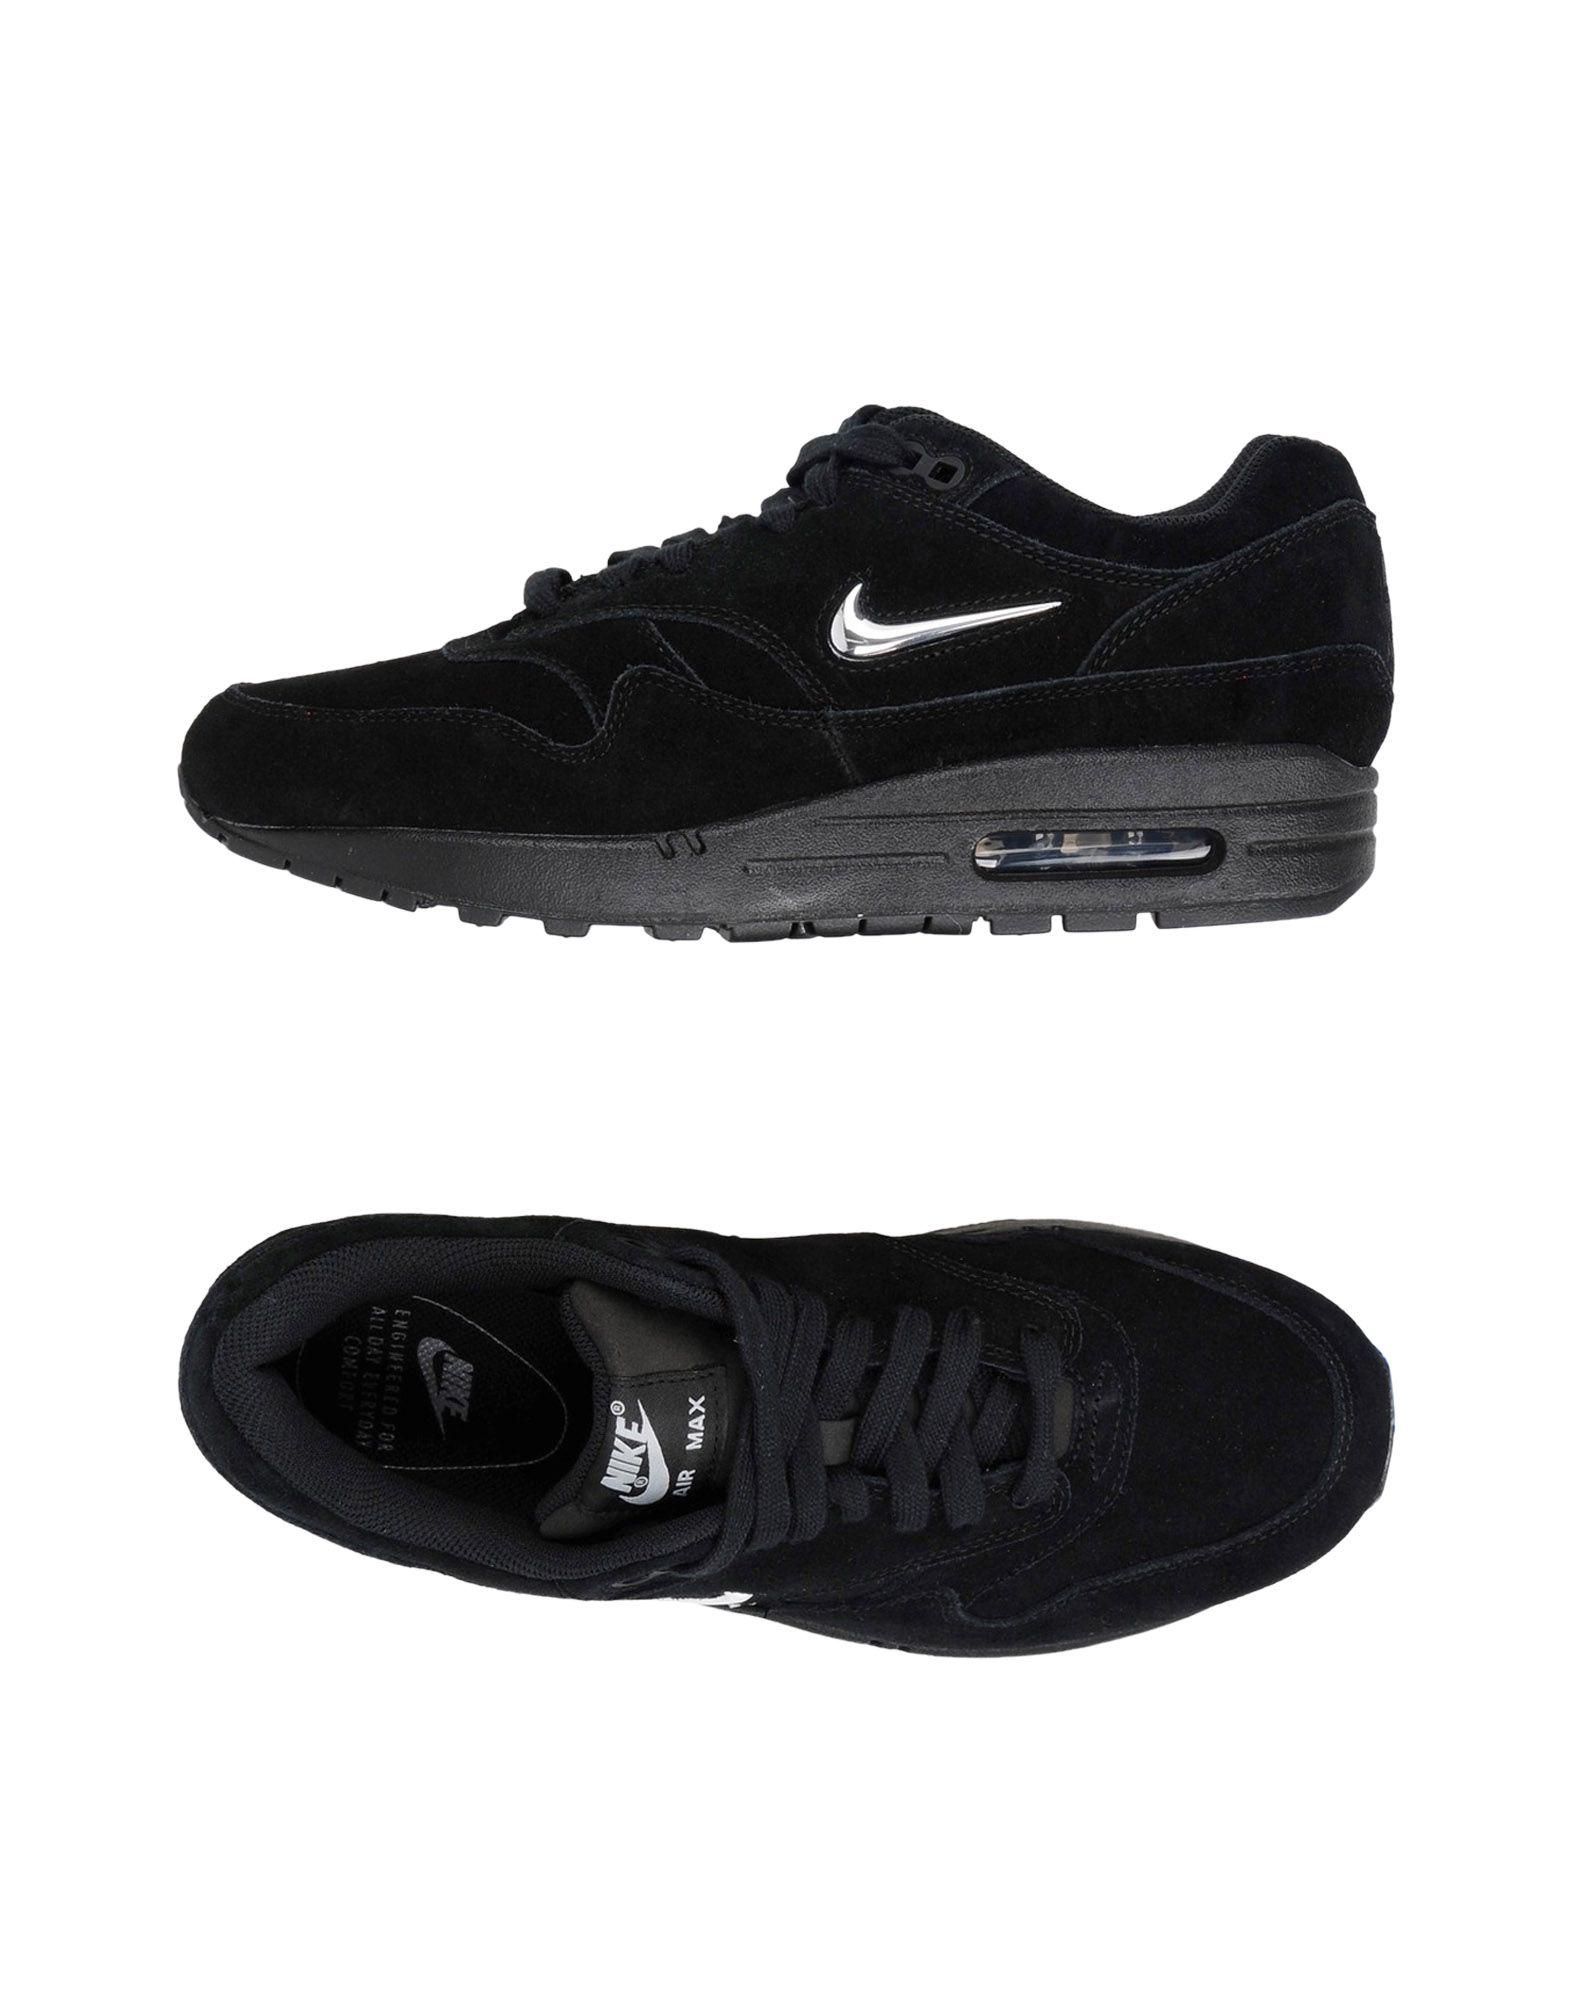 Sneakers Nike Air Max 1 Premium Sc - Donna - 11421986FS